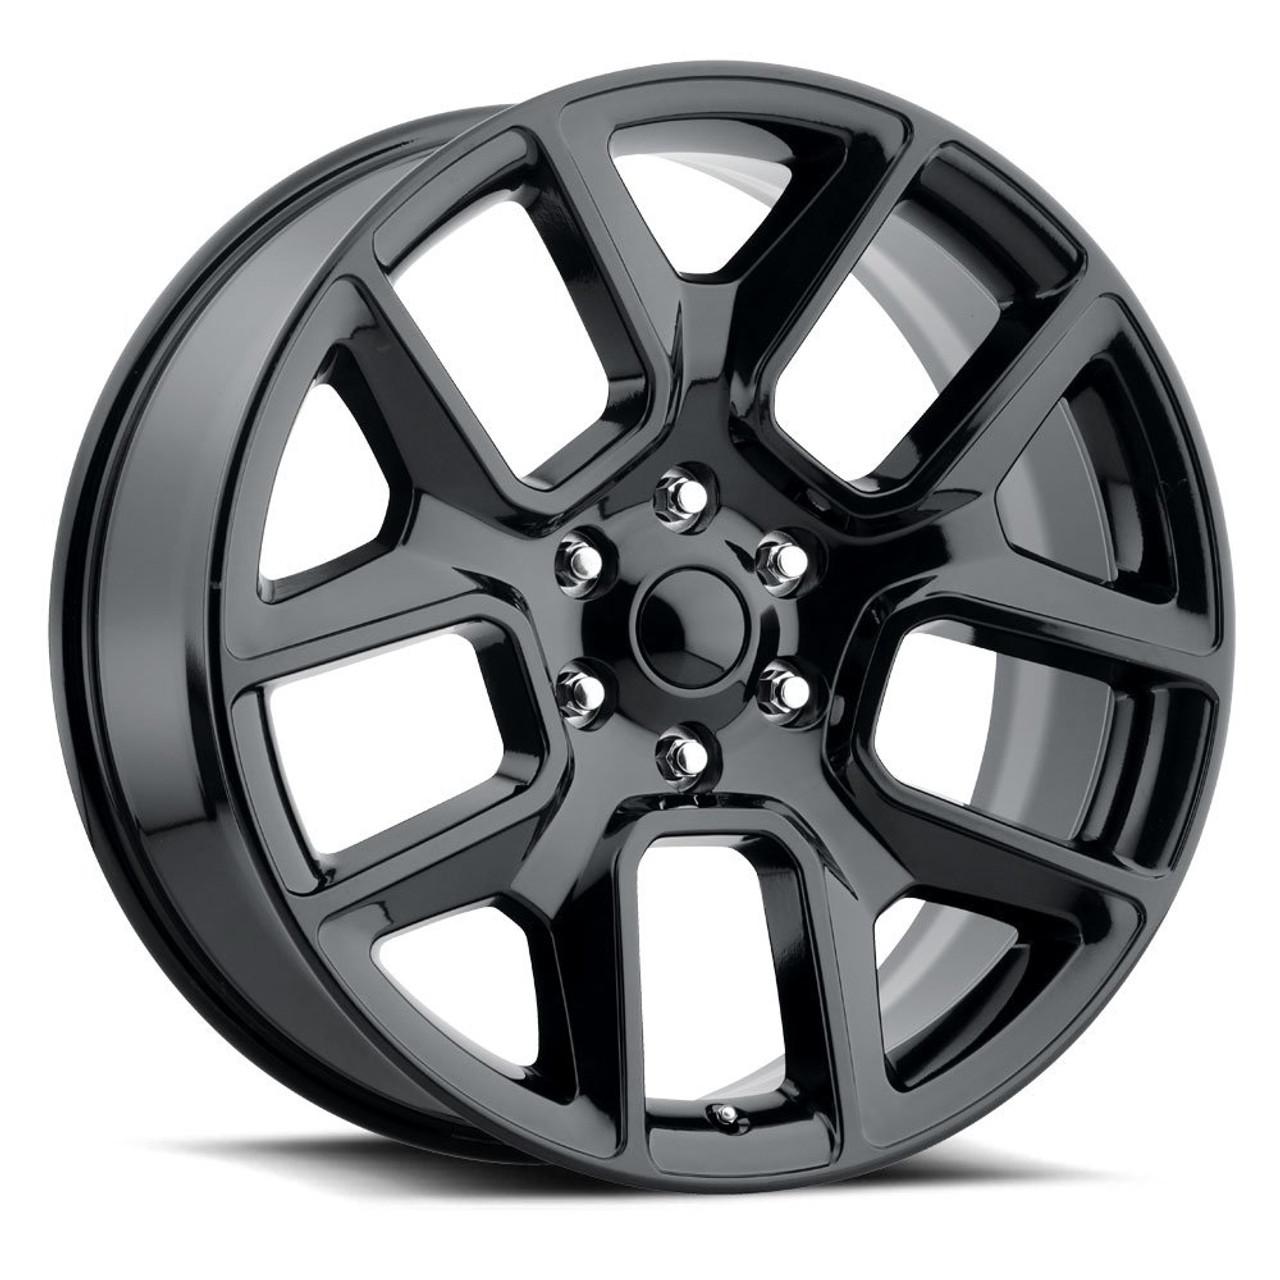 Dodge Ram Rims >> 22 Fit S 2019 Dodge Ram 1500 Laramie Hemi Wheels Gloss Black Set Of 4 22x9 Rims